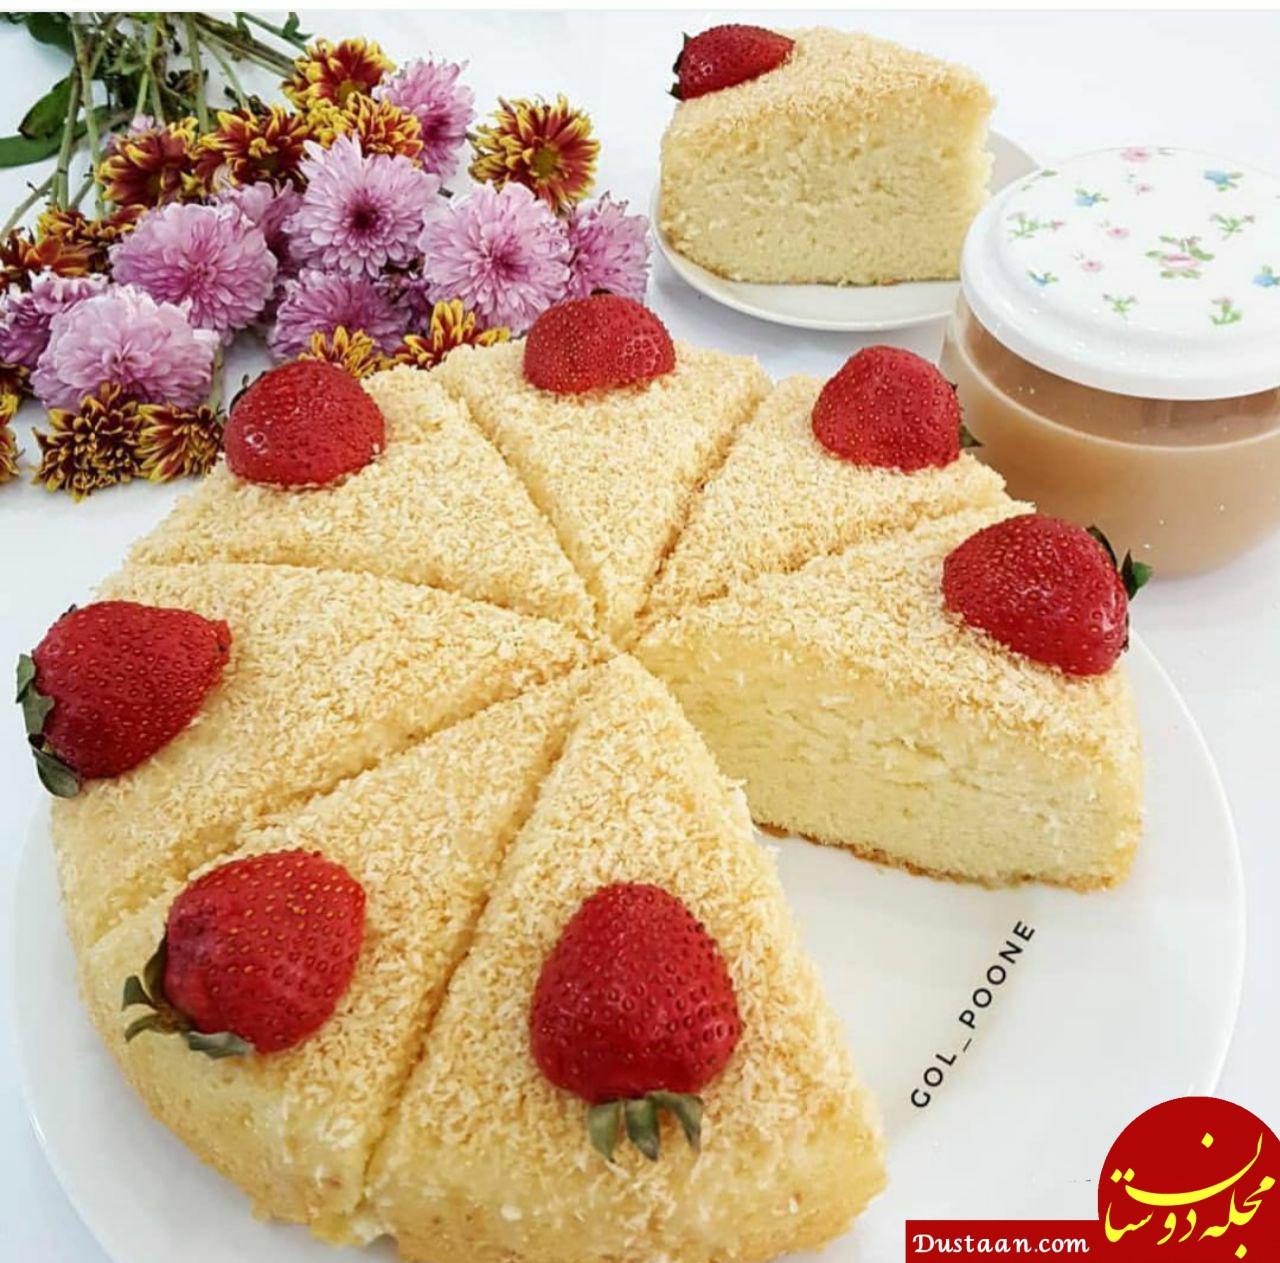 www.dustaan.com - طرز تهیه کیک شنی به سبکی خوشمزه و متفاوت